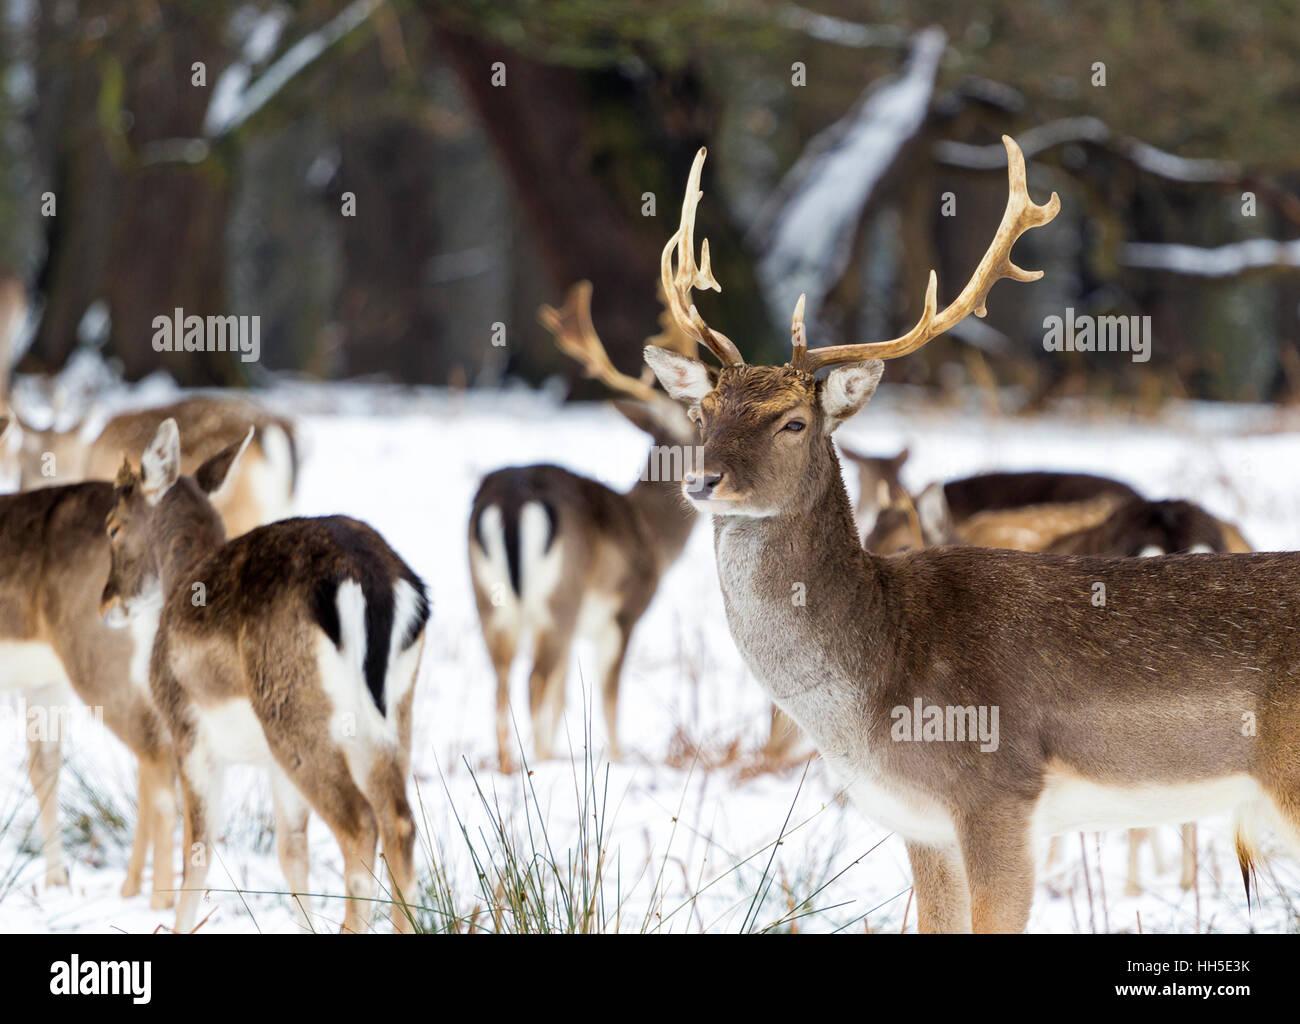 Deers in snow in Richmond Park, London - Stock Image